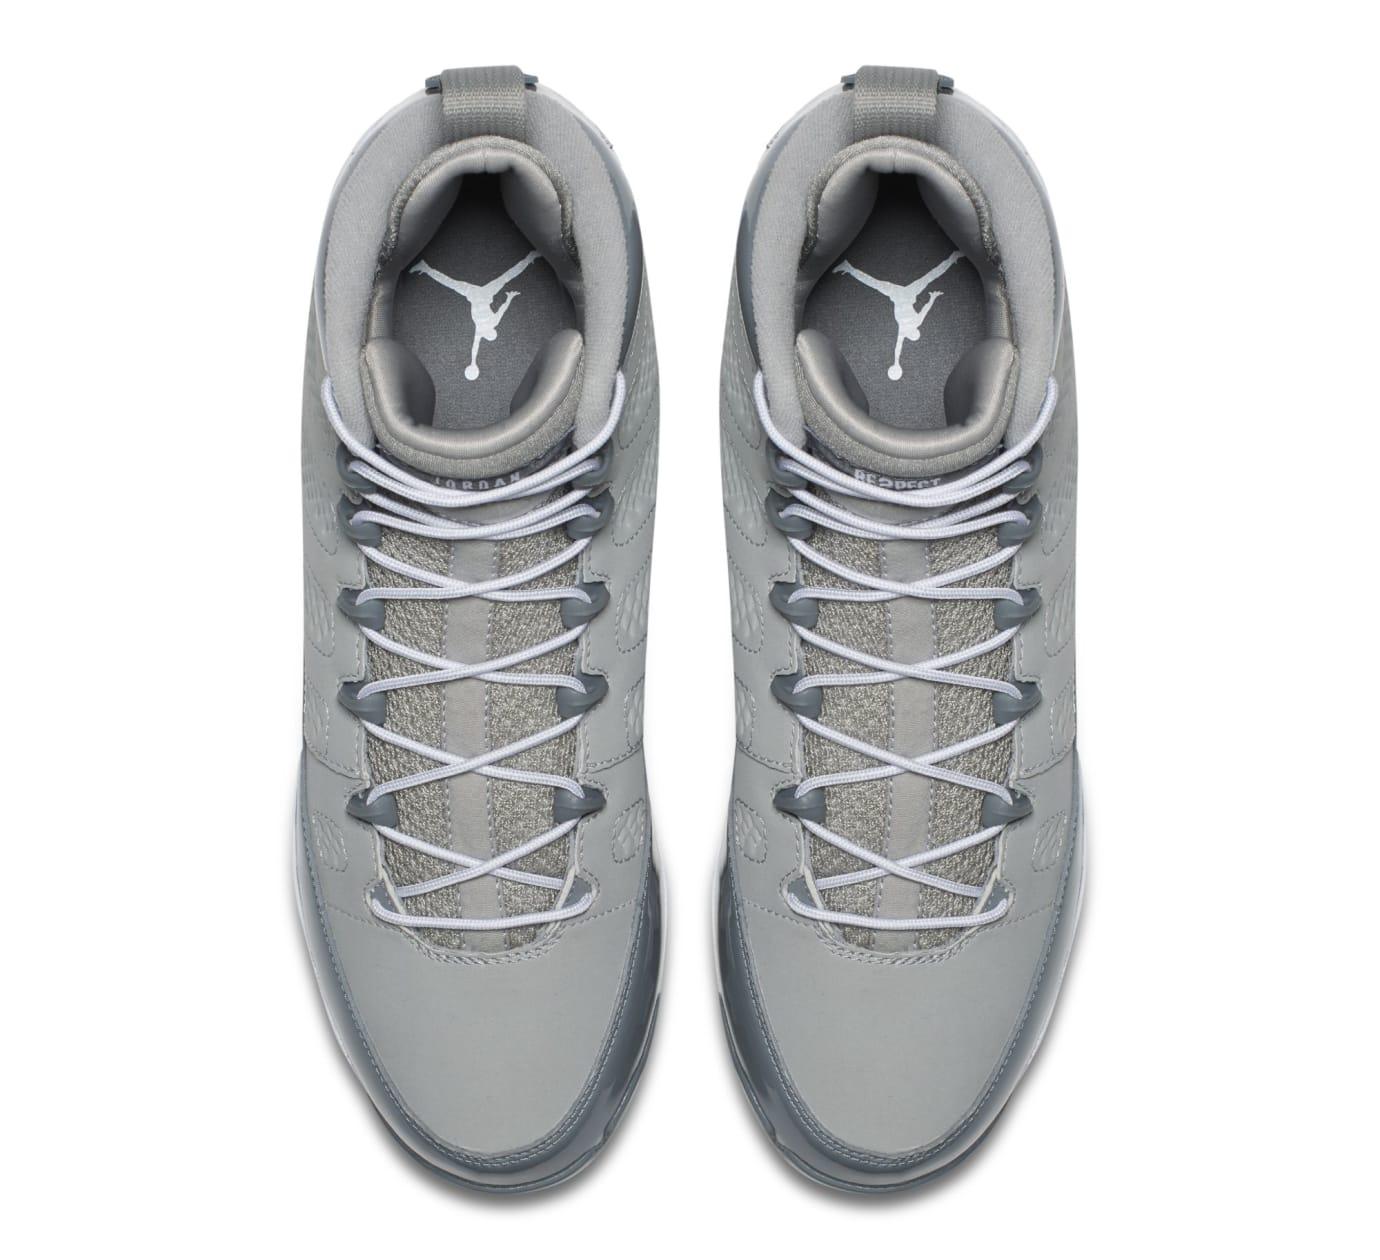 Air Jordan 9 IX MCS Baseball Cleats Cool Grey Top